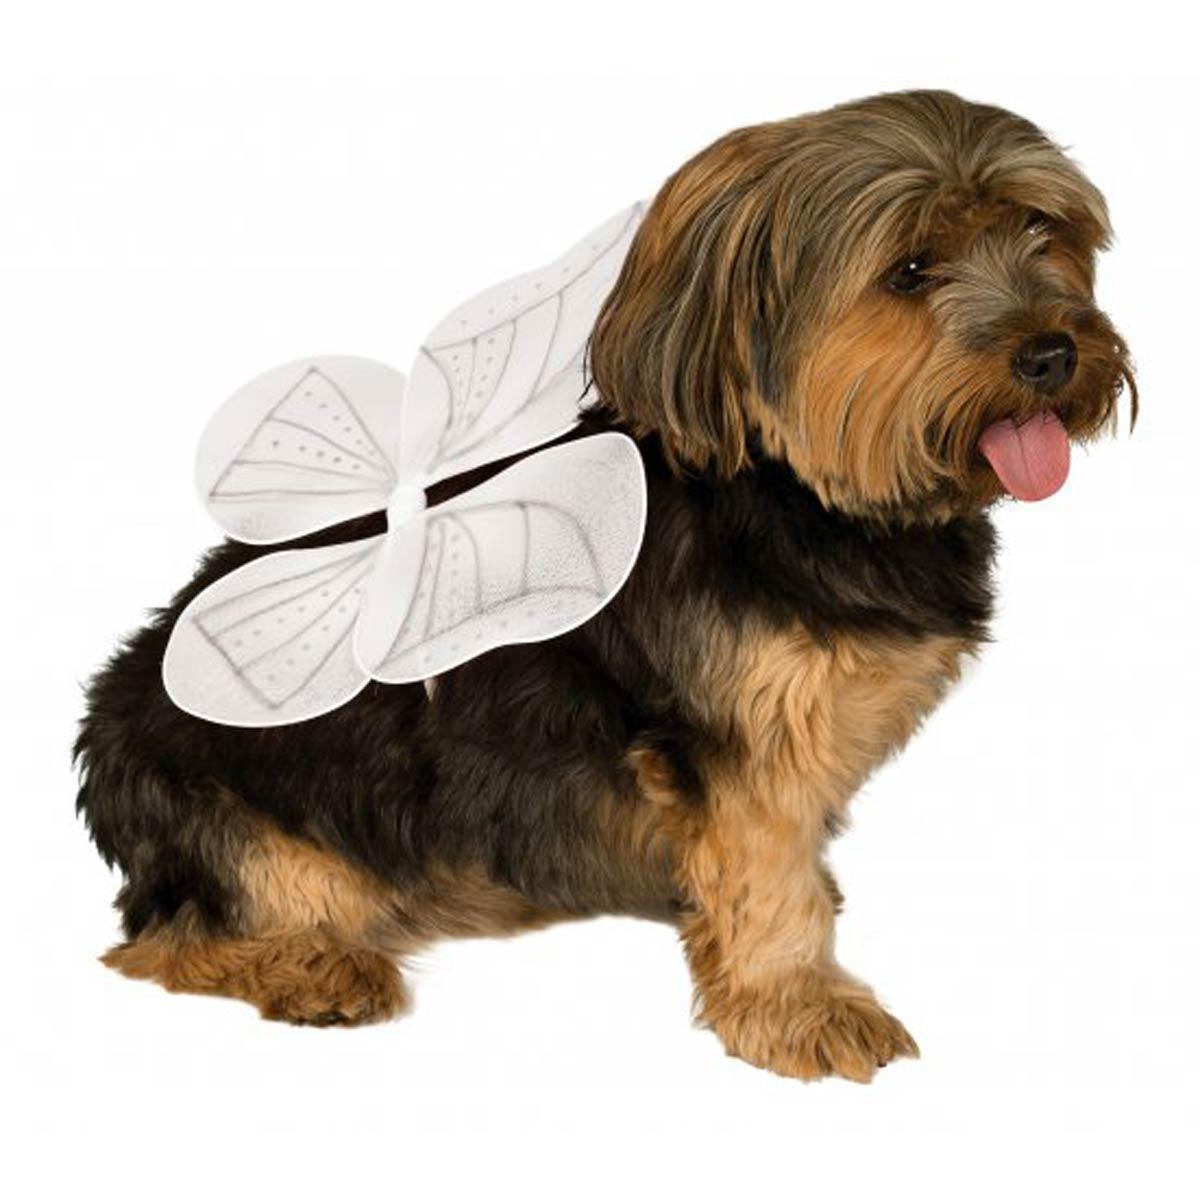 Angel Wings Dog Costume - White